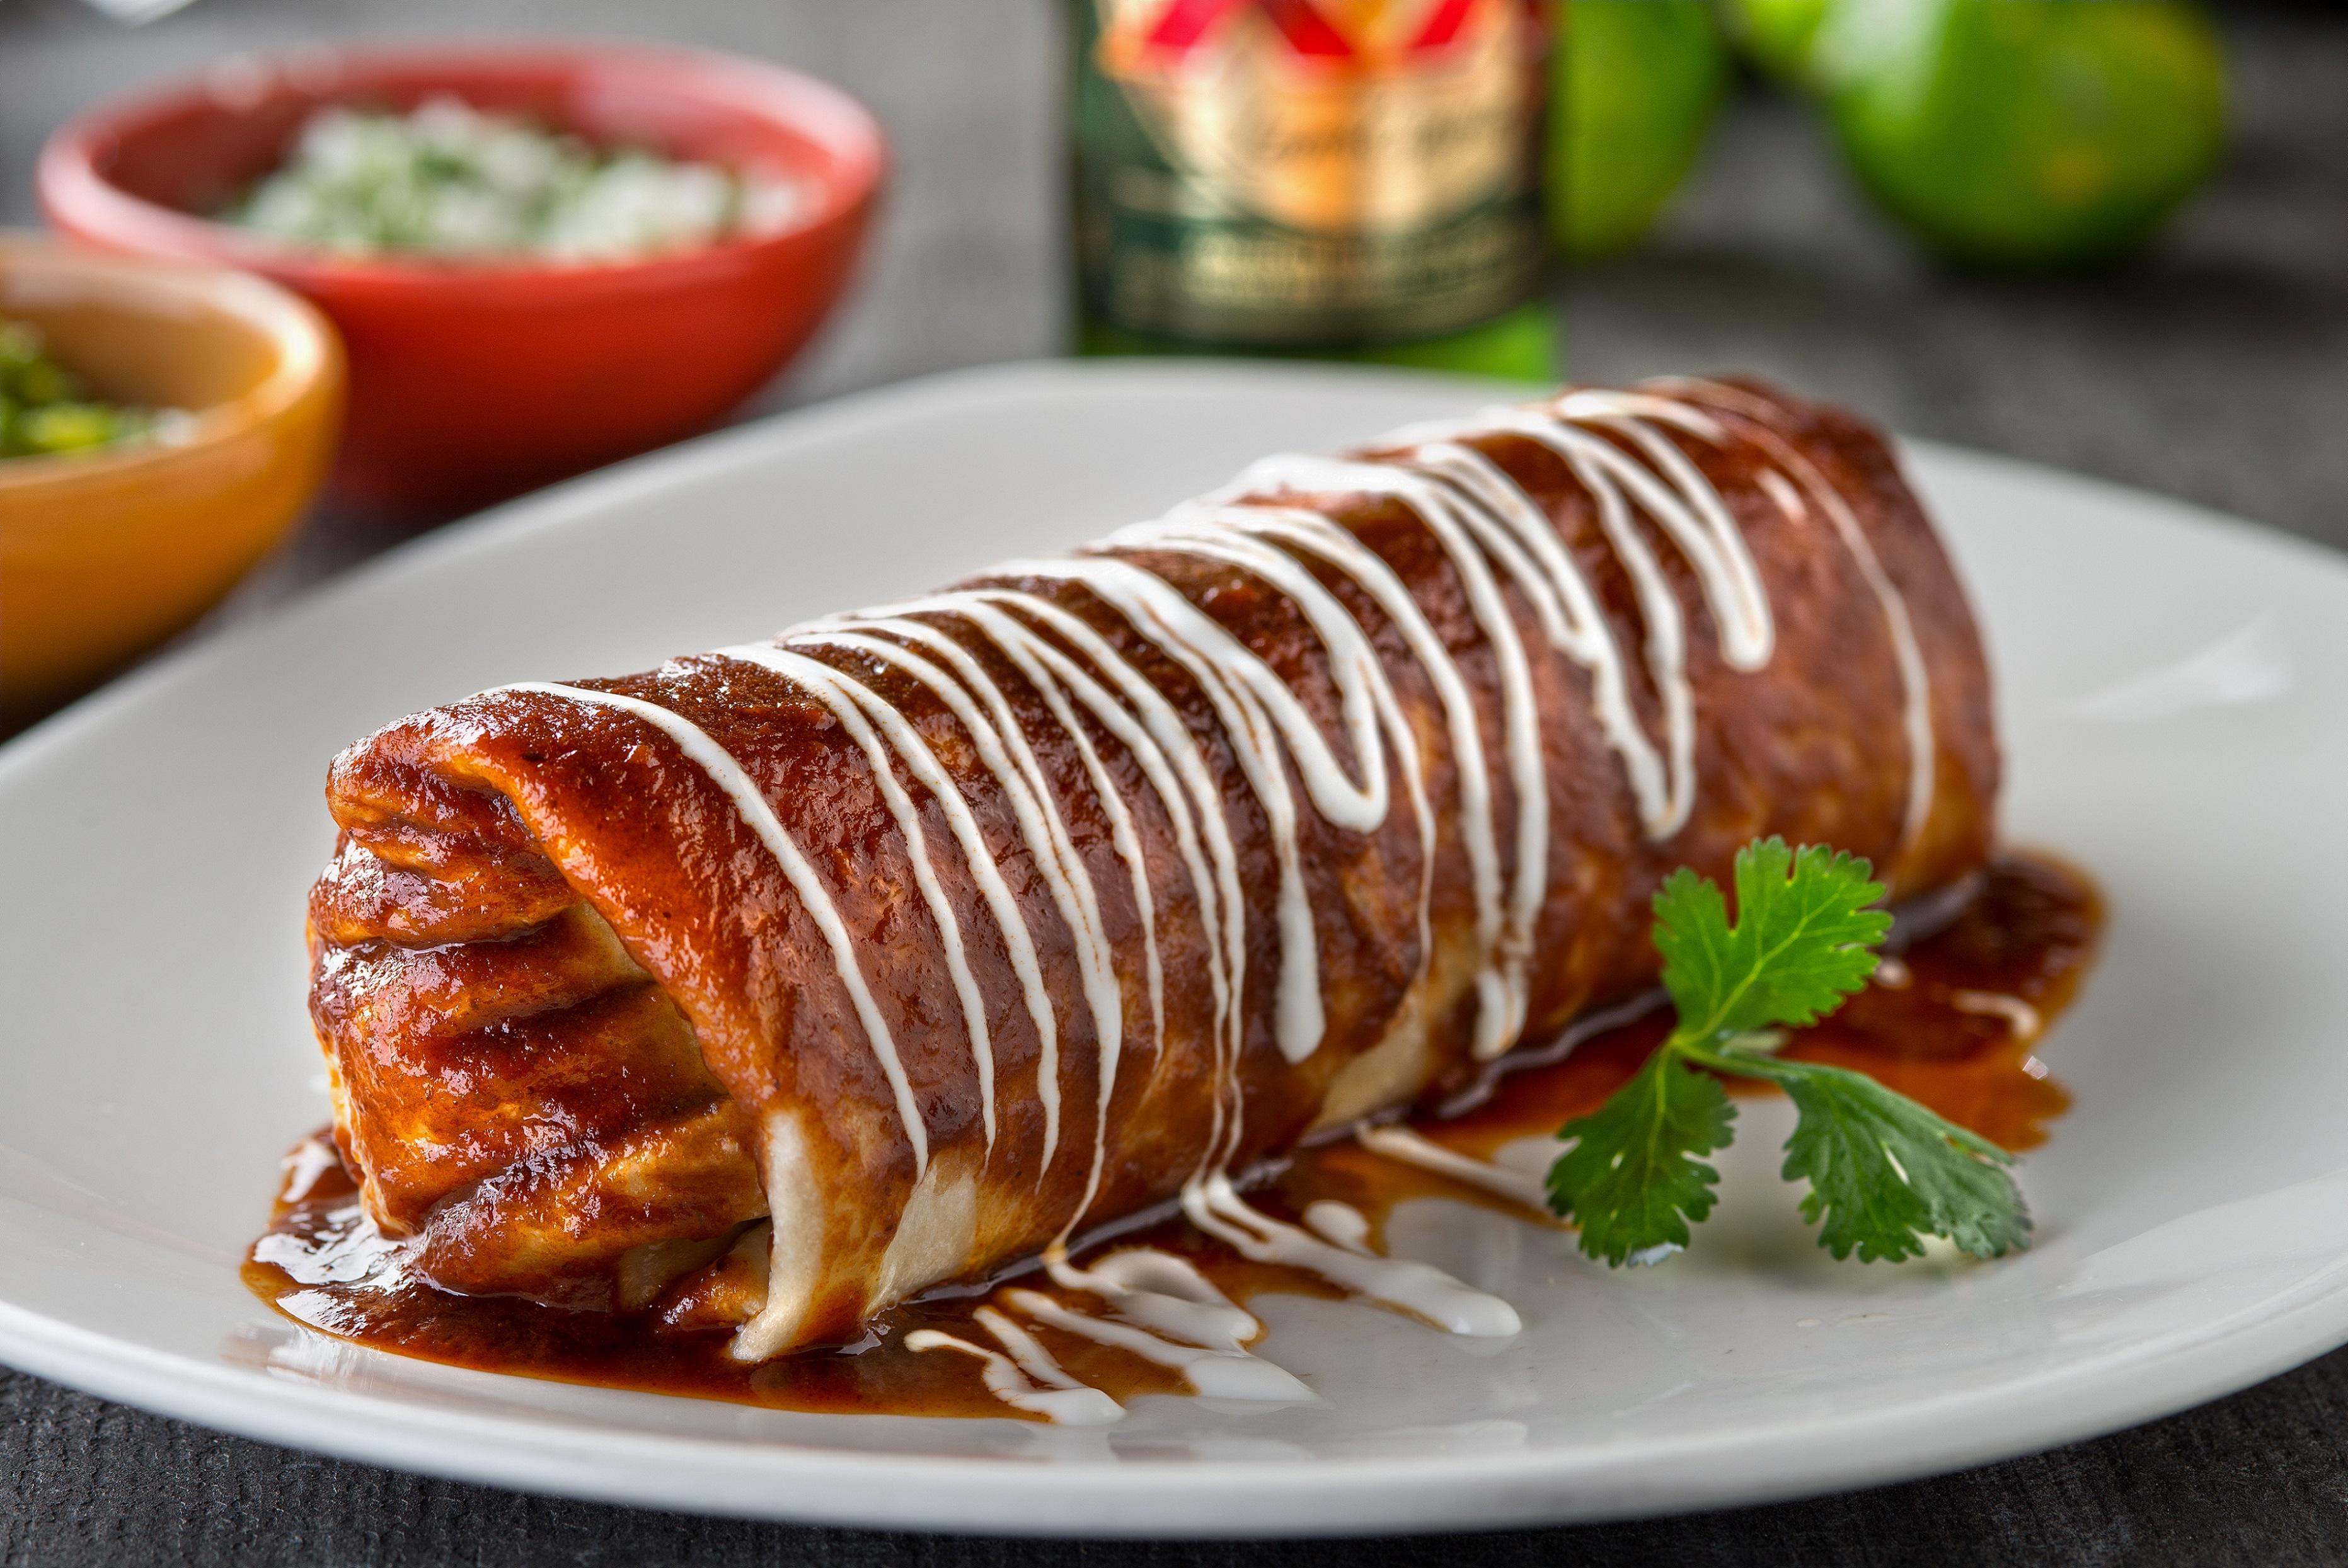 A beef barbacoa burrito on a white plate.